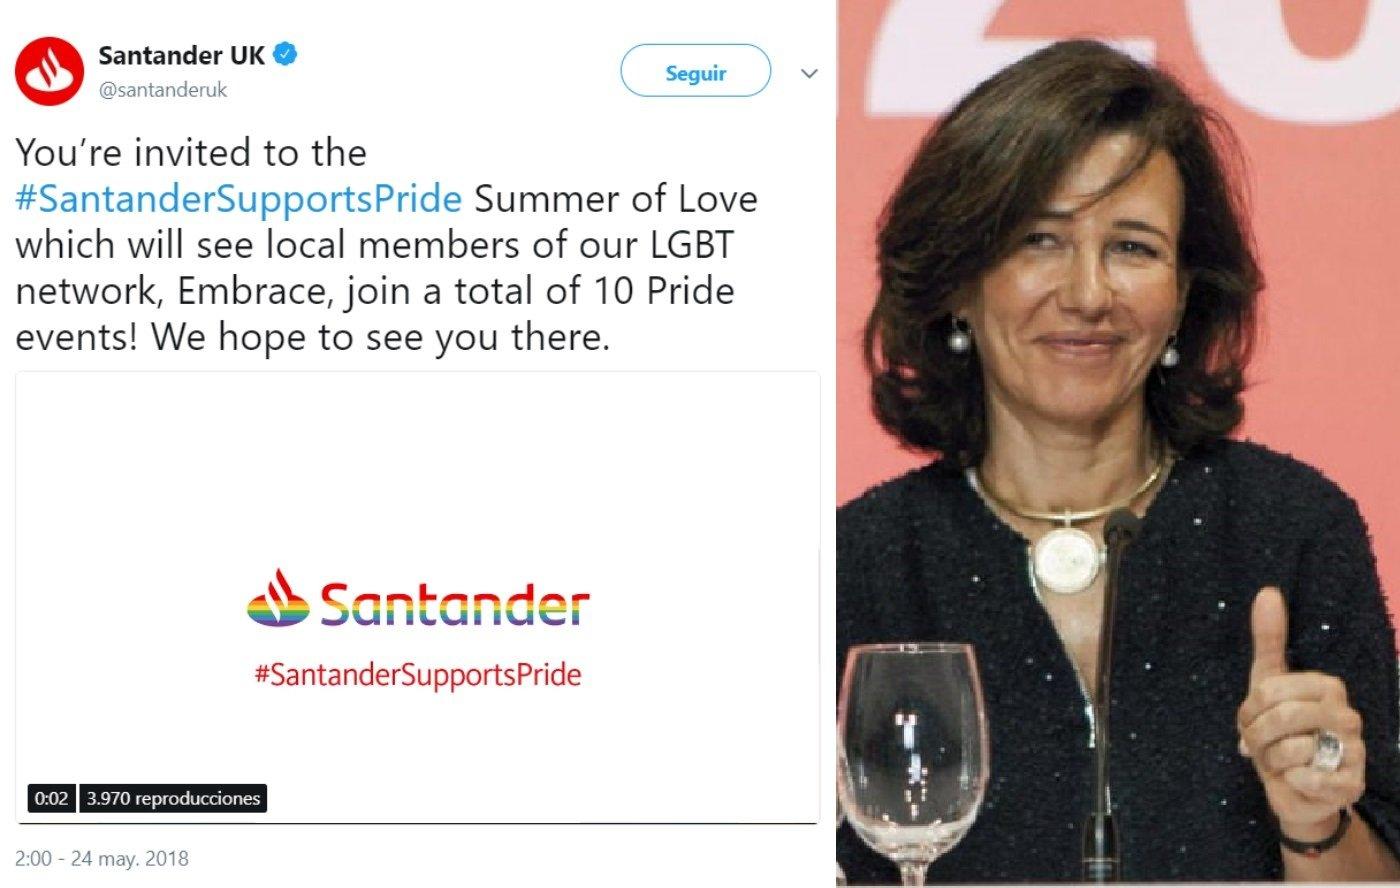 CONTACTOS GAYS EN CORTE INGLES CANTABRIA